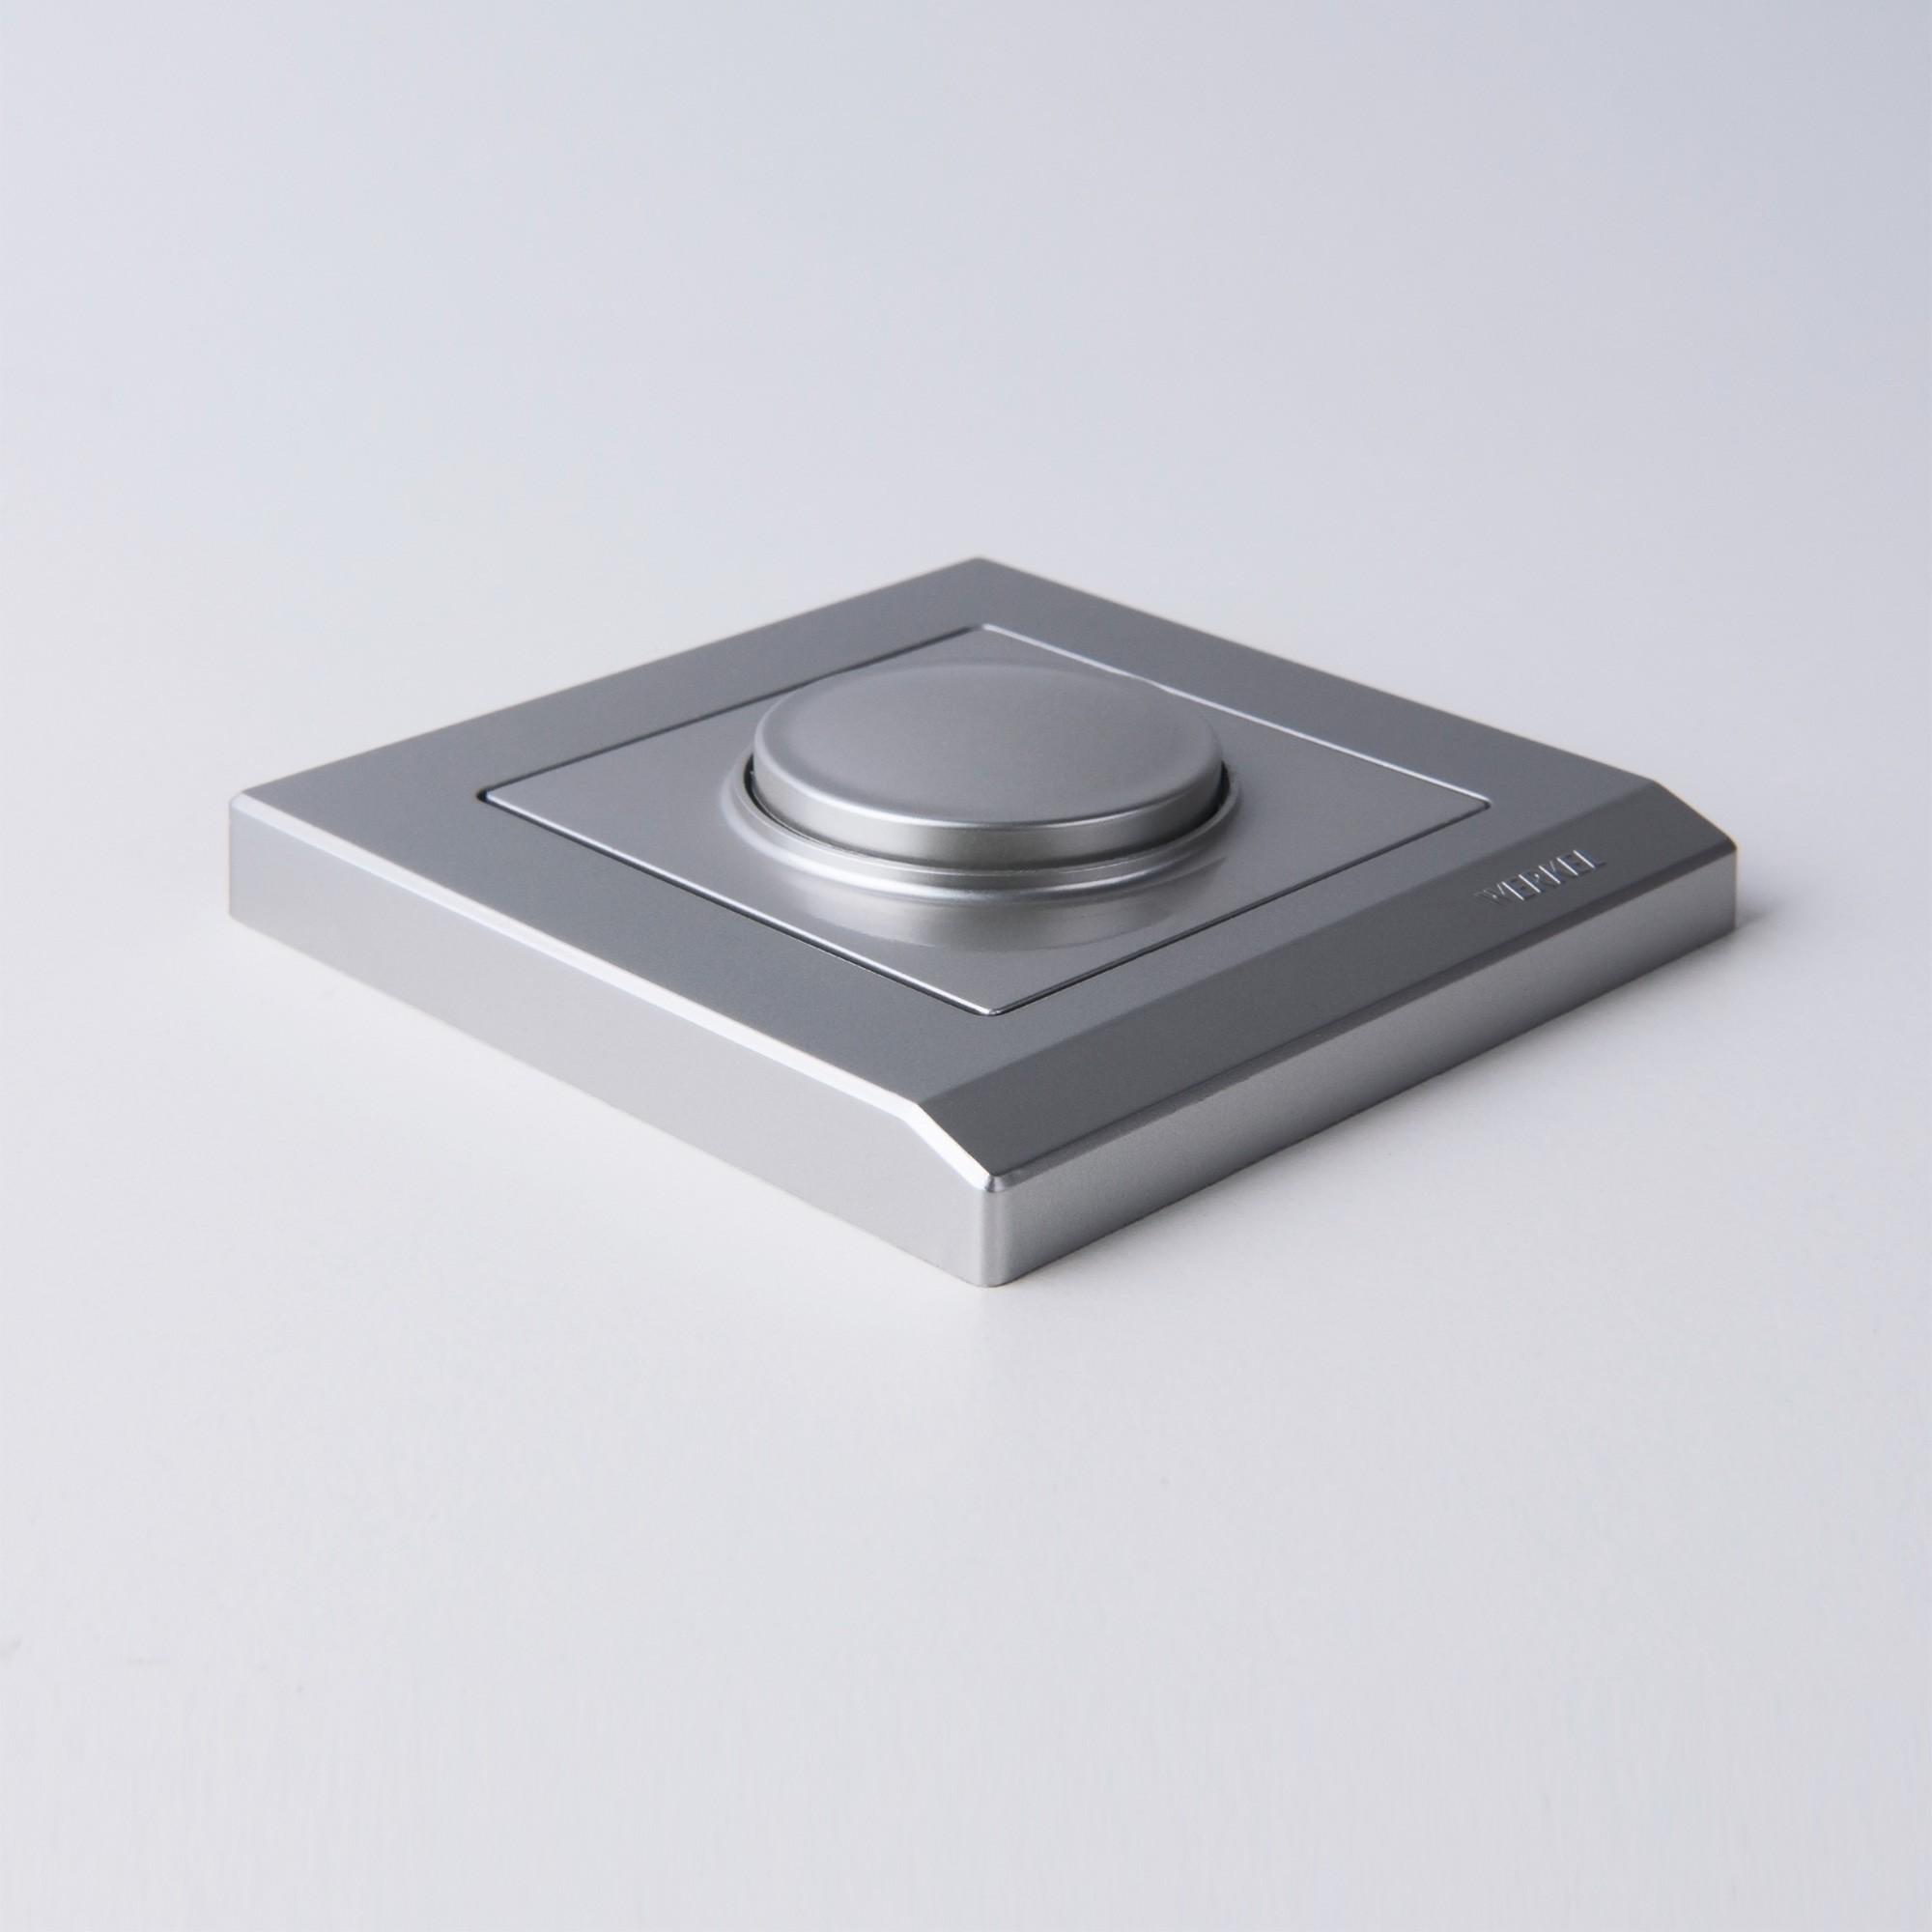 WL04-Frame-01 /Рамка на 1 пост (серебряный)